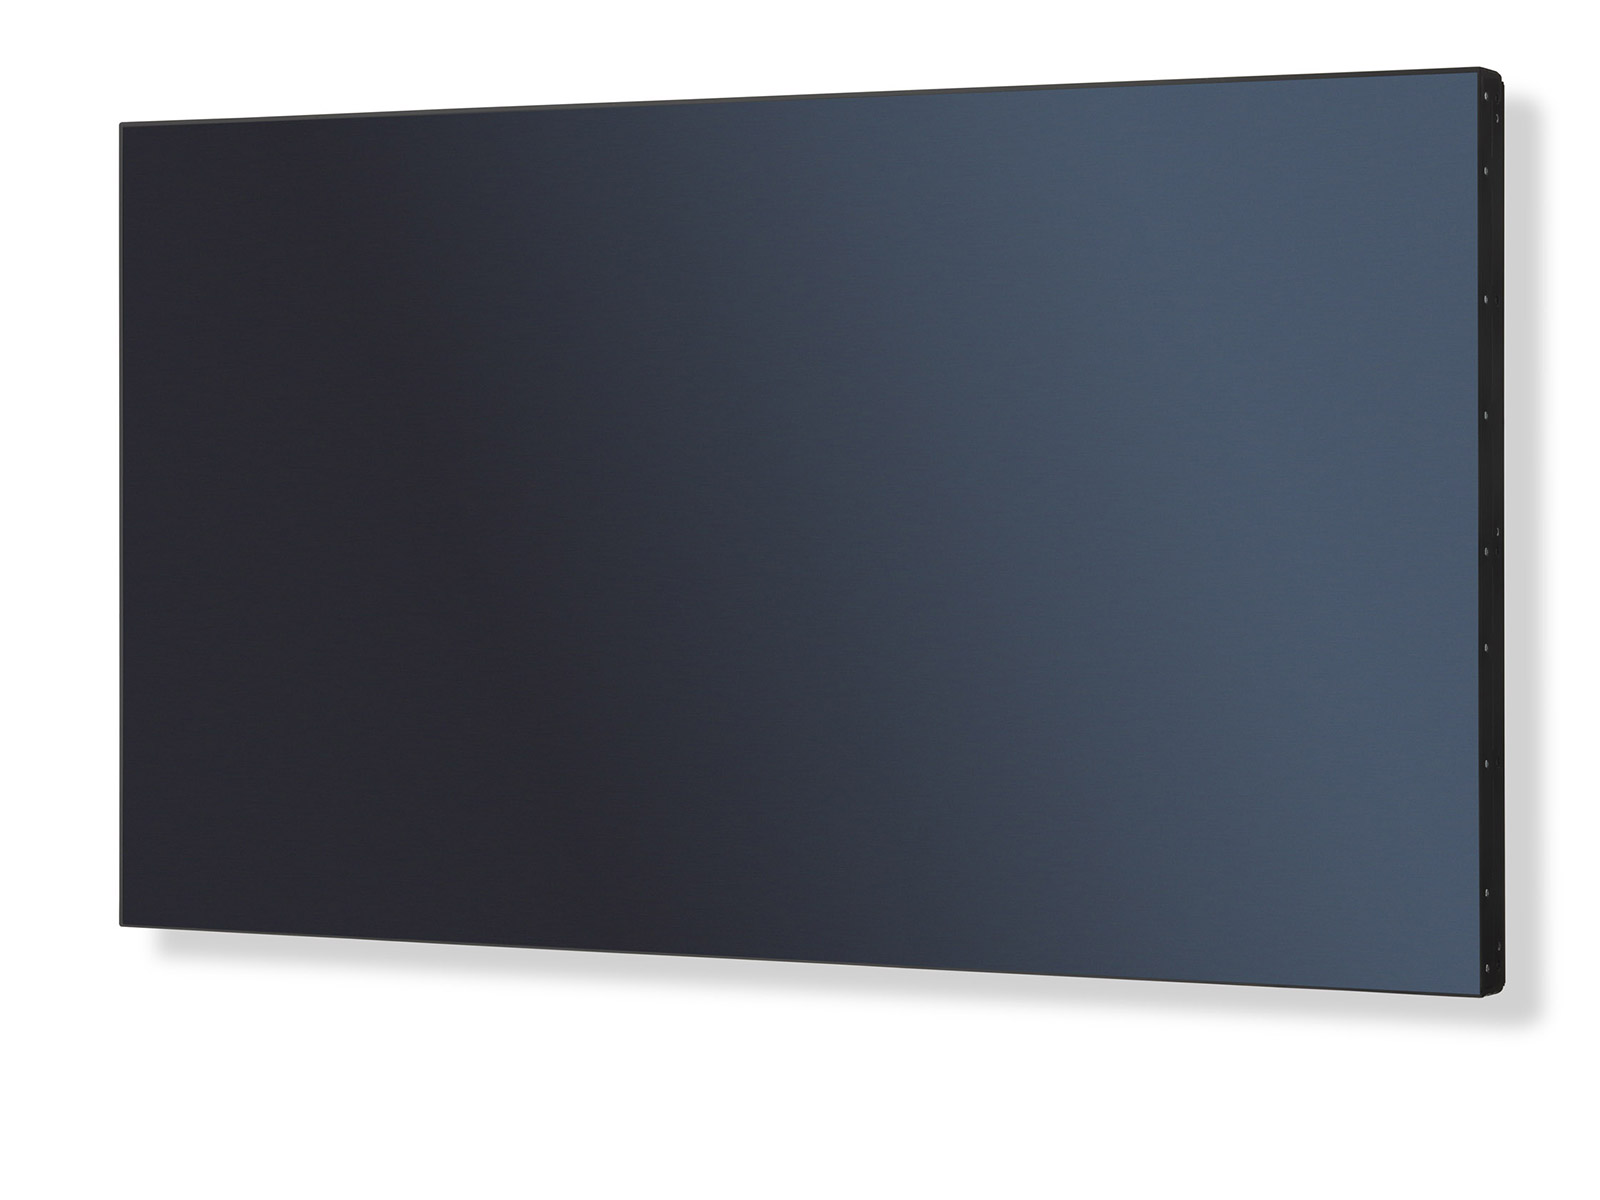 X554UNV-DisplayViewLeftBlack